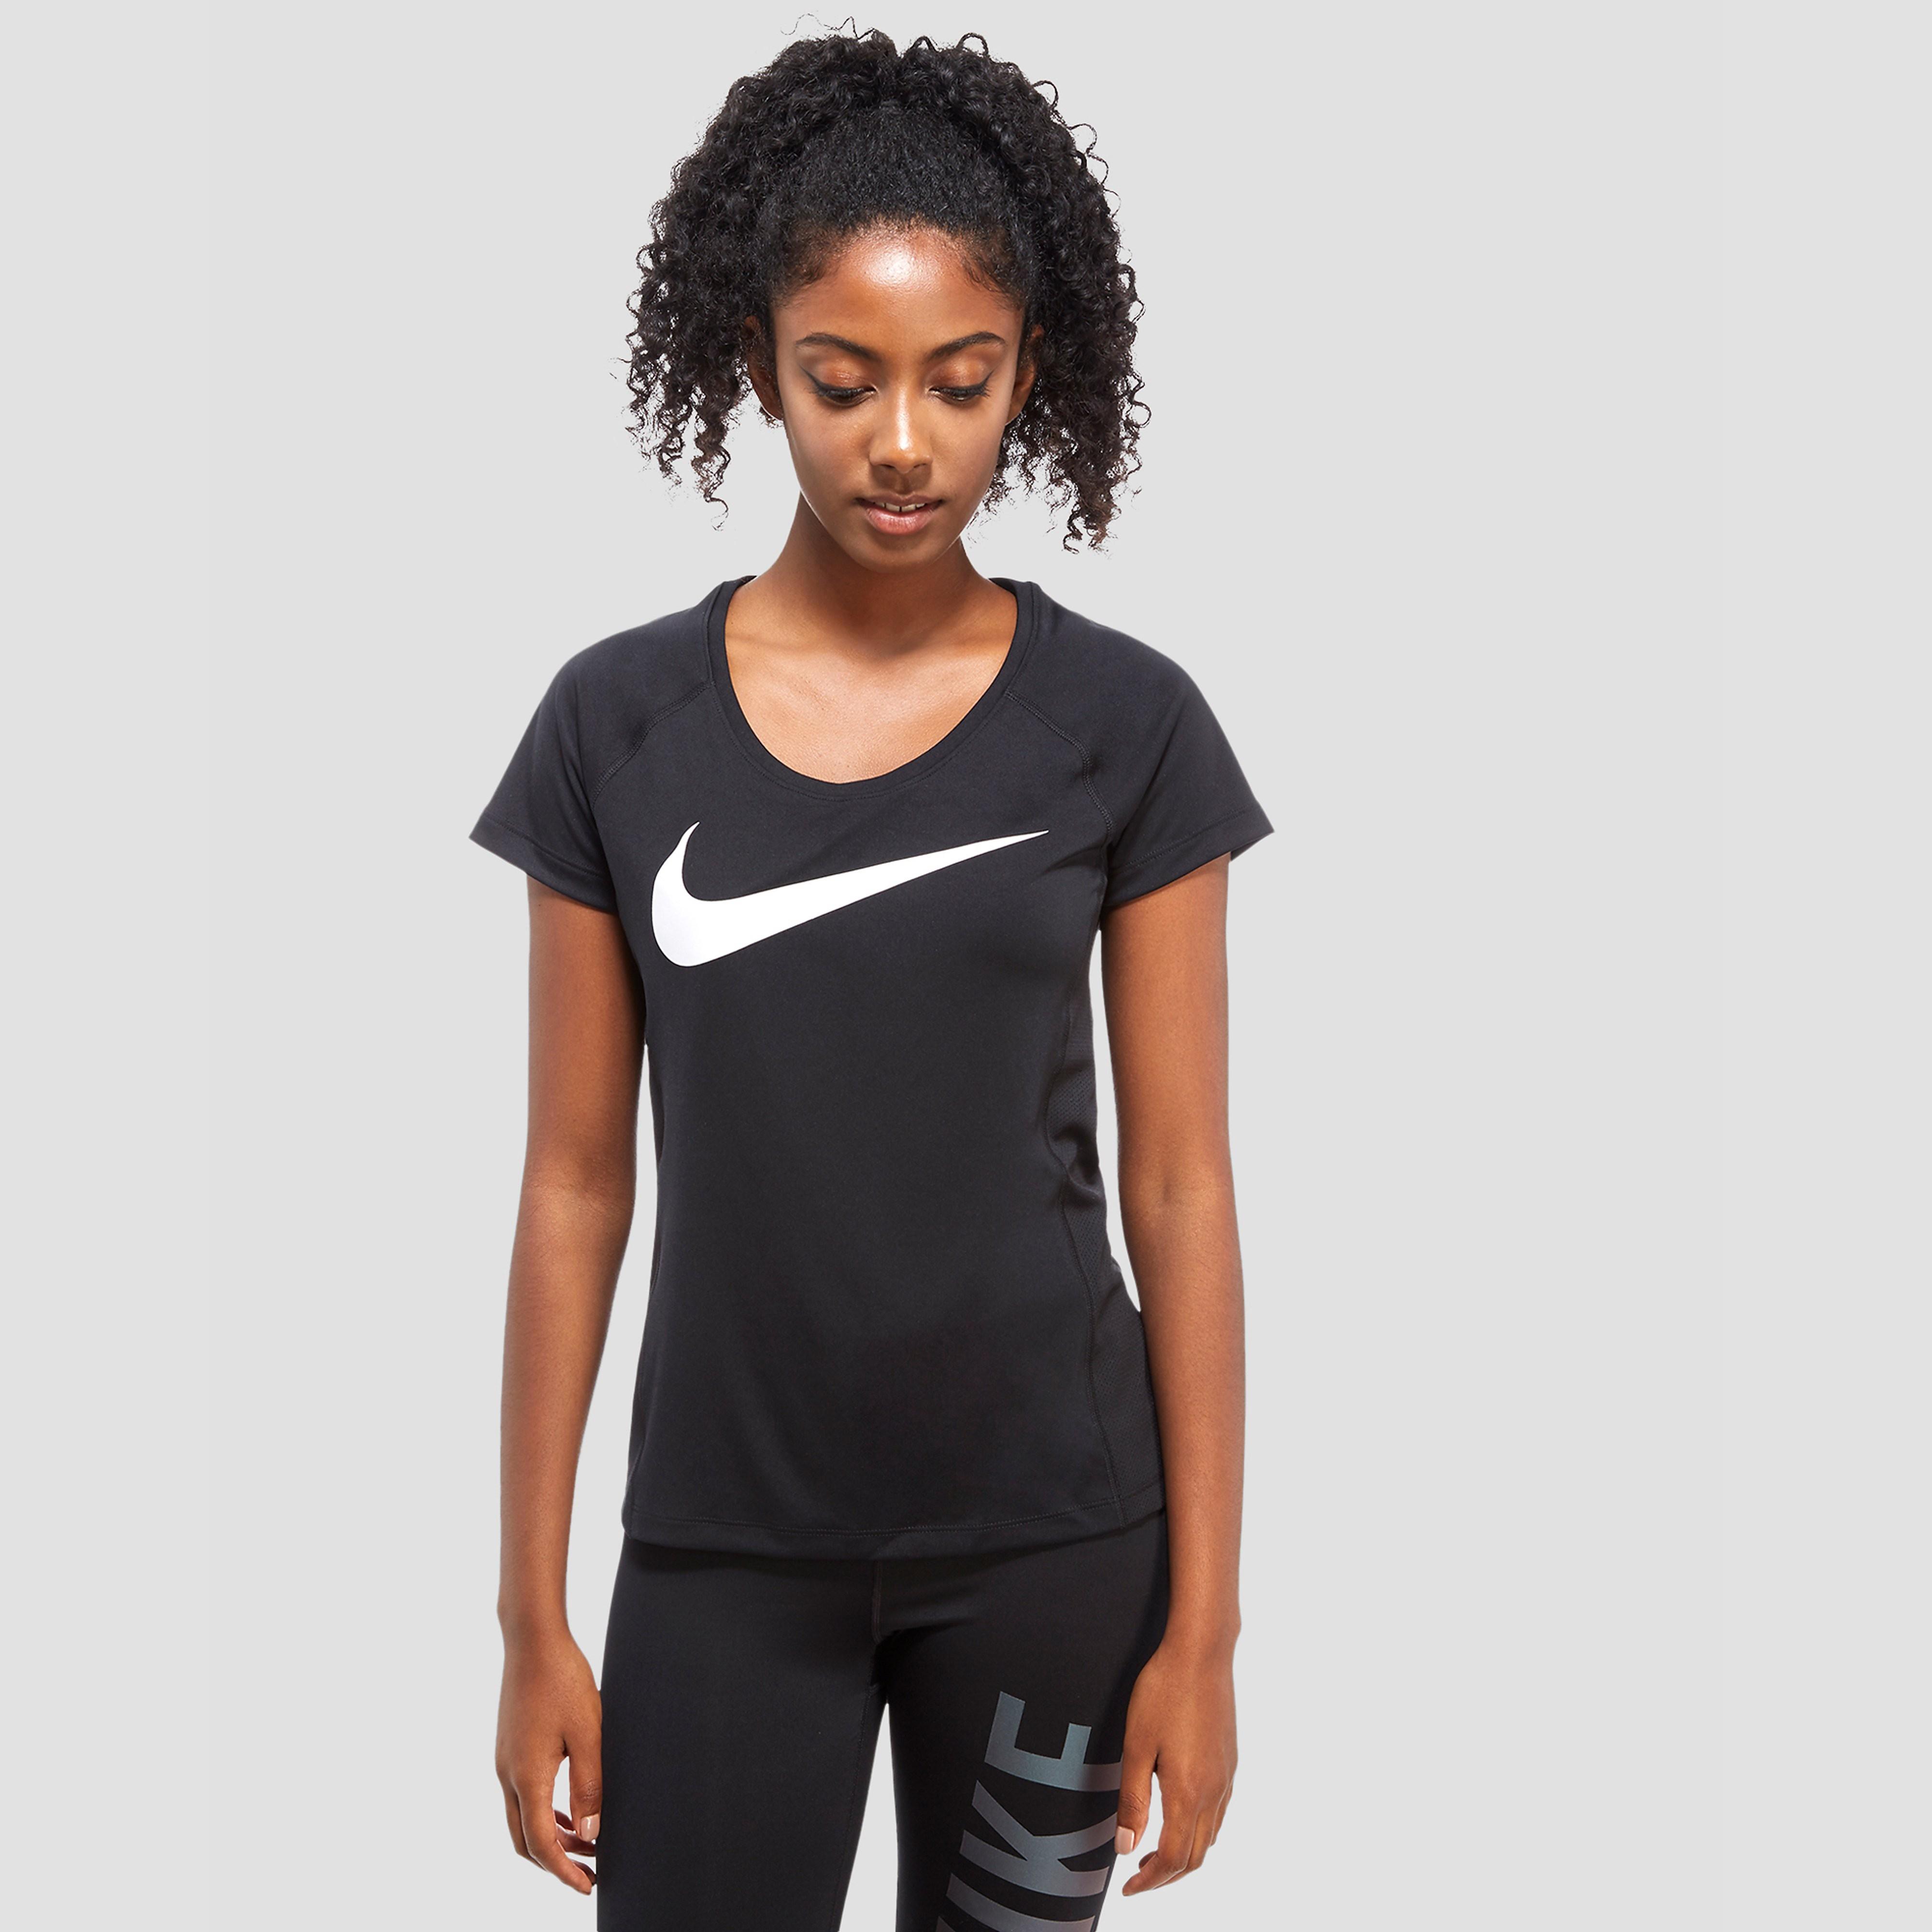 Nike Dry Miler Women's Running Top